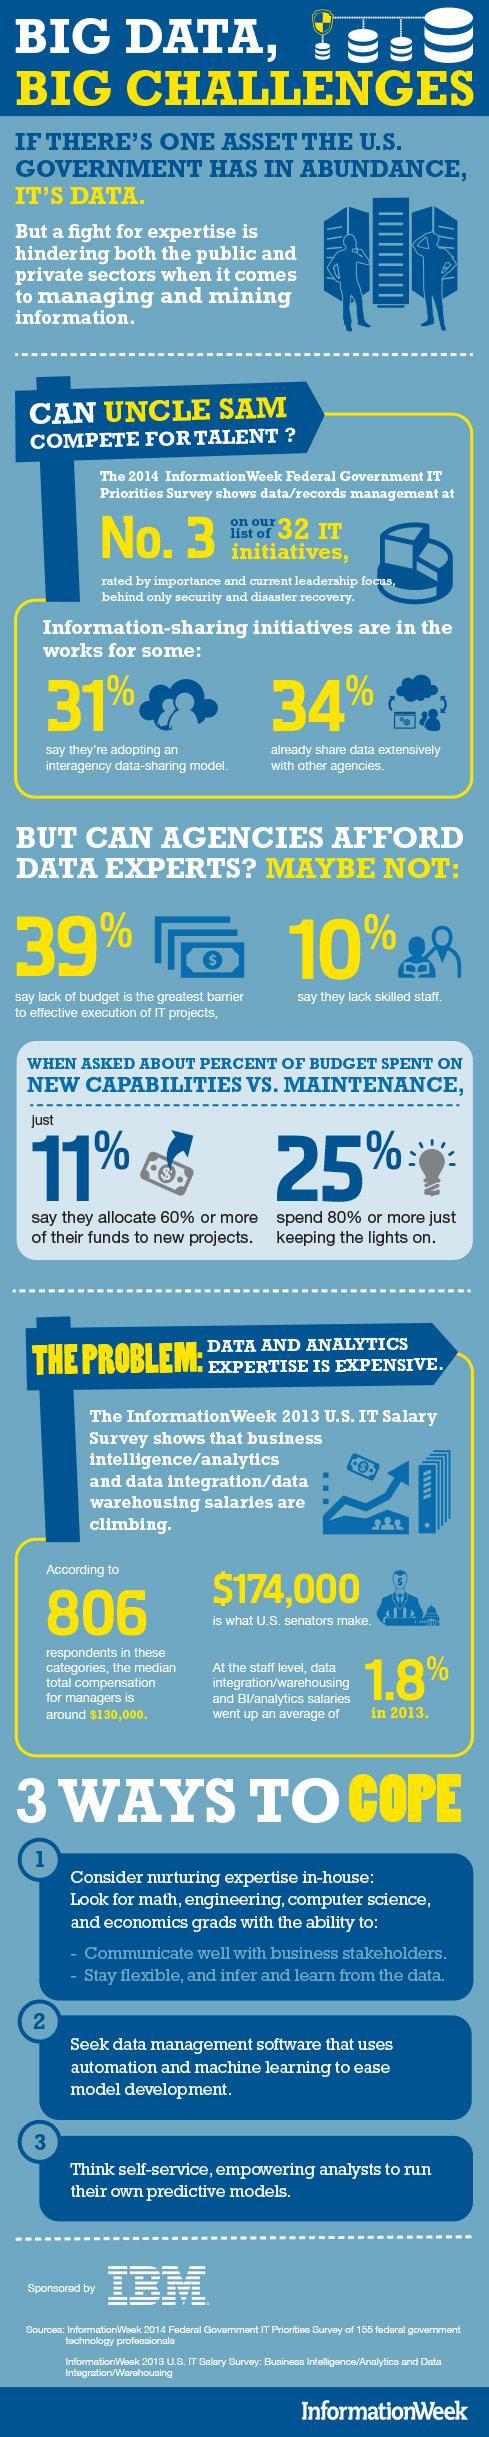 Big Data, Big Challenges